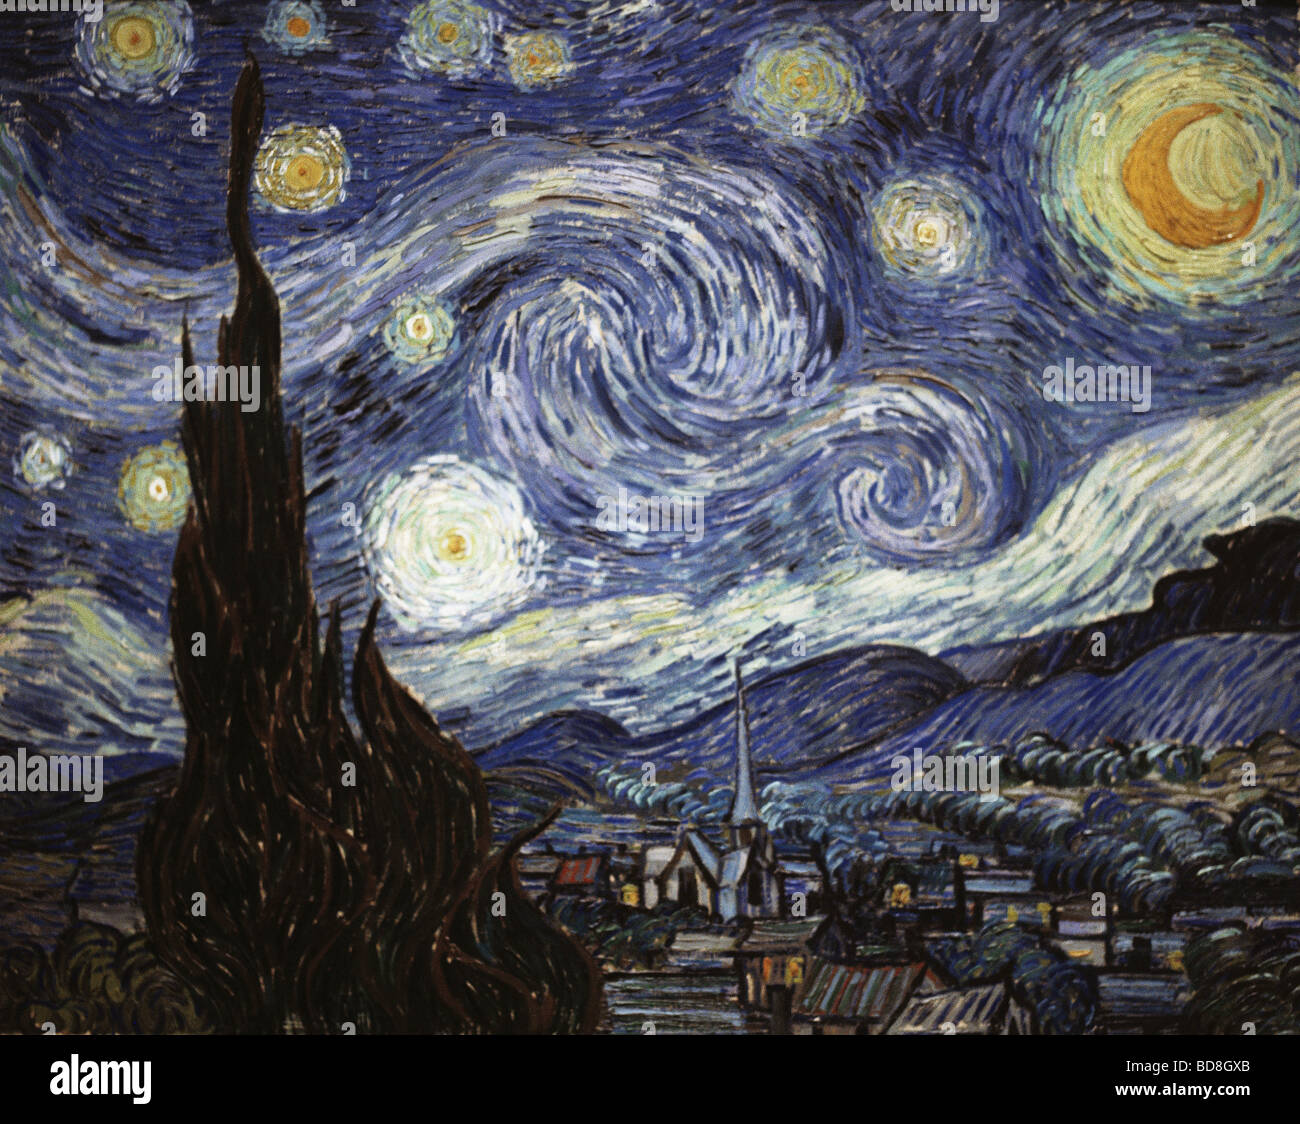 "Bildende Kunst, Gogh, Vincent van, (1853-1890), Malerei, ""Sternennacht"", Öl auf Leinwand, 73 x 92 Stockbild"